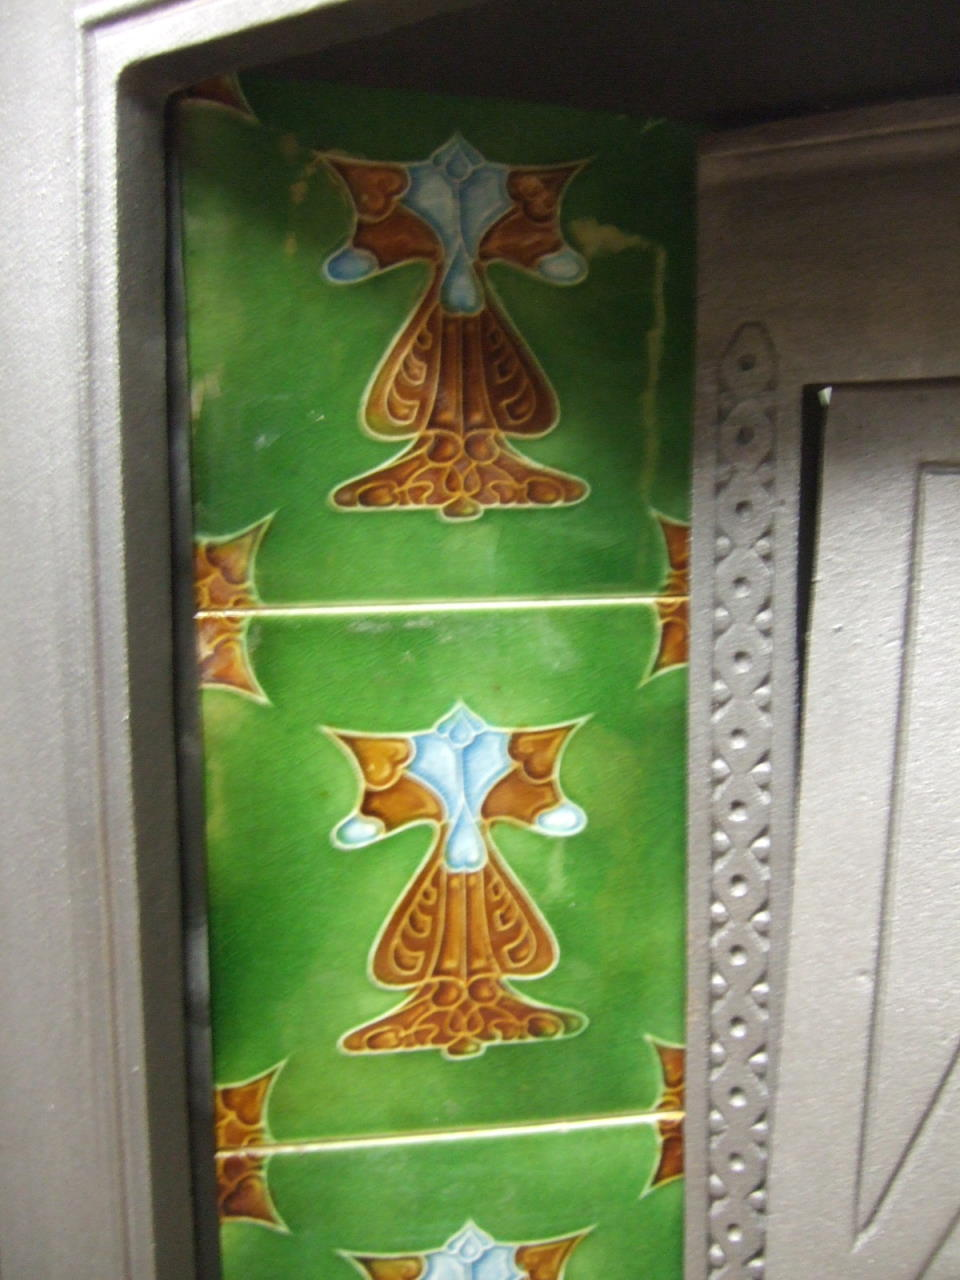 Original Art Nouveau Fireplace Tiles - AN016 - Old Fireplaces